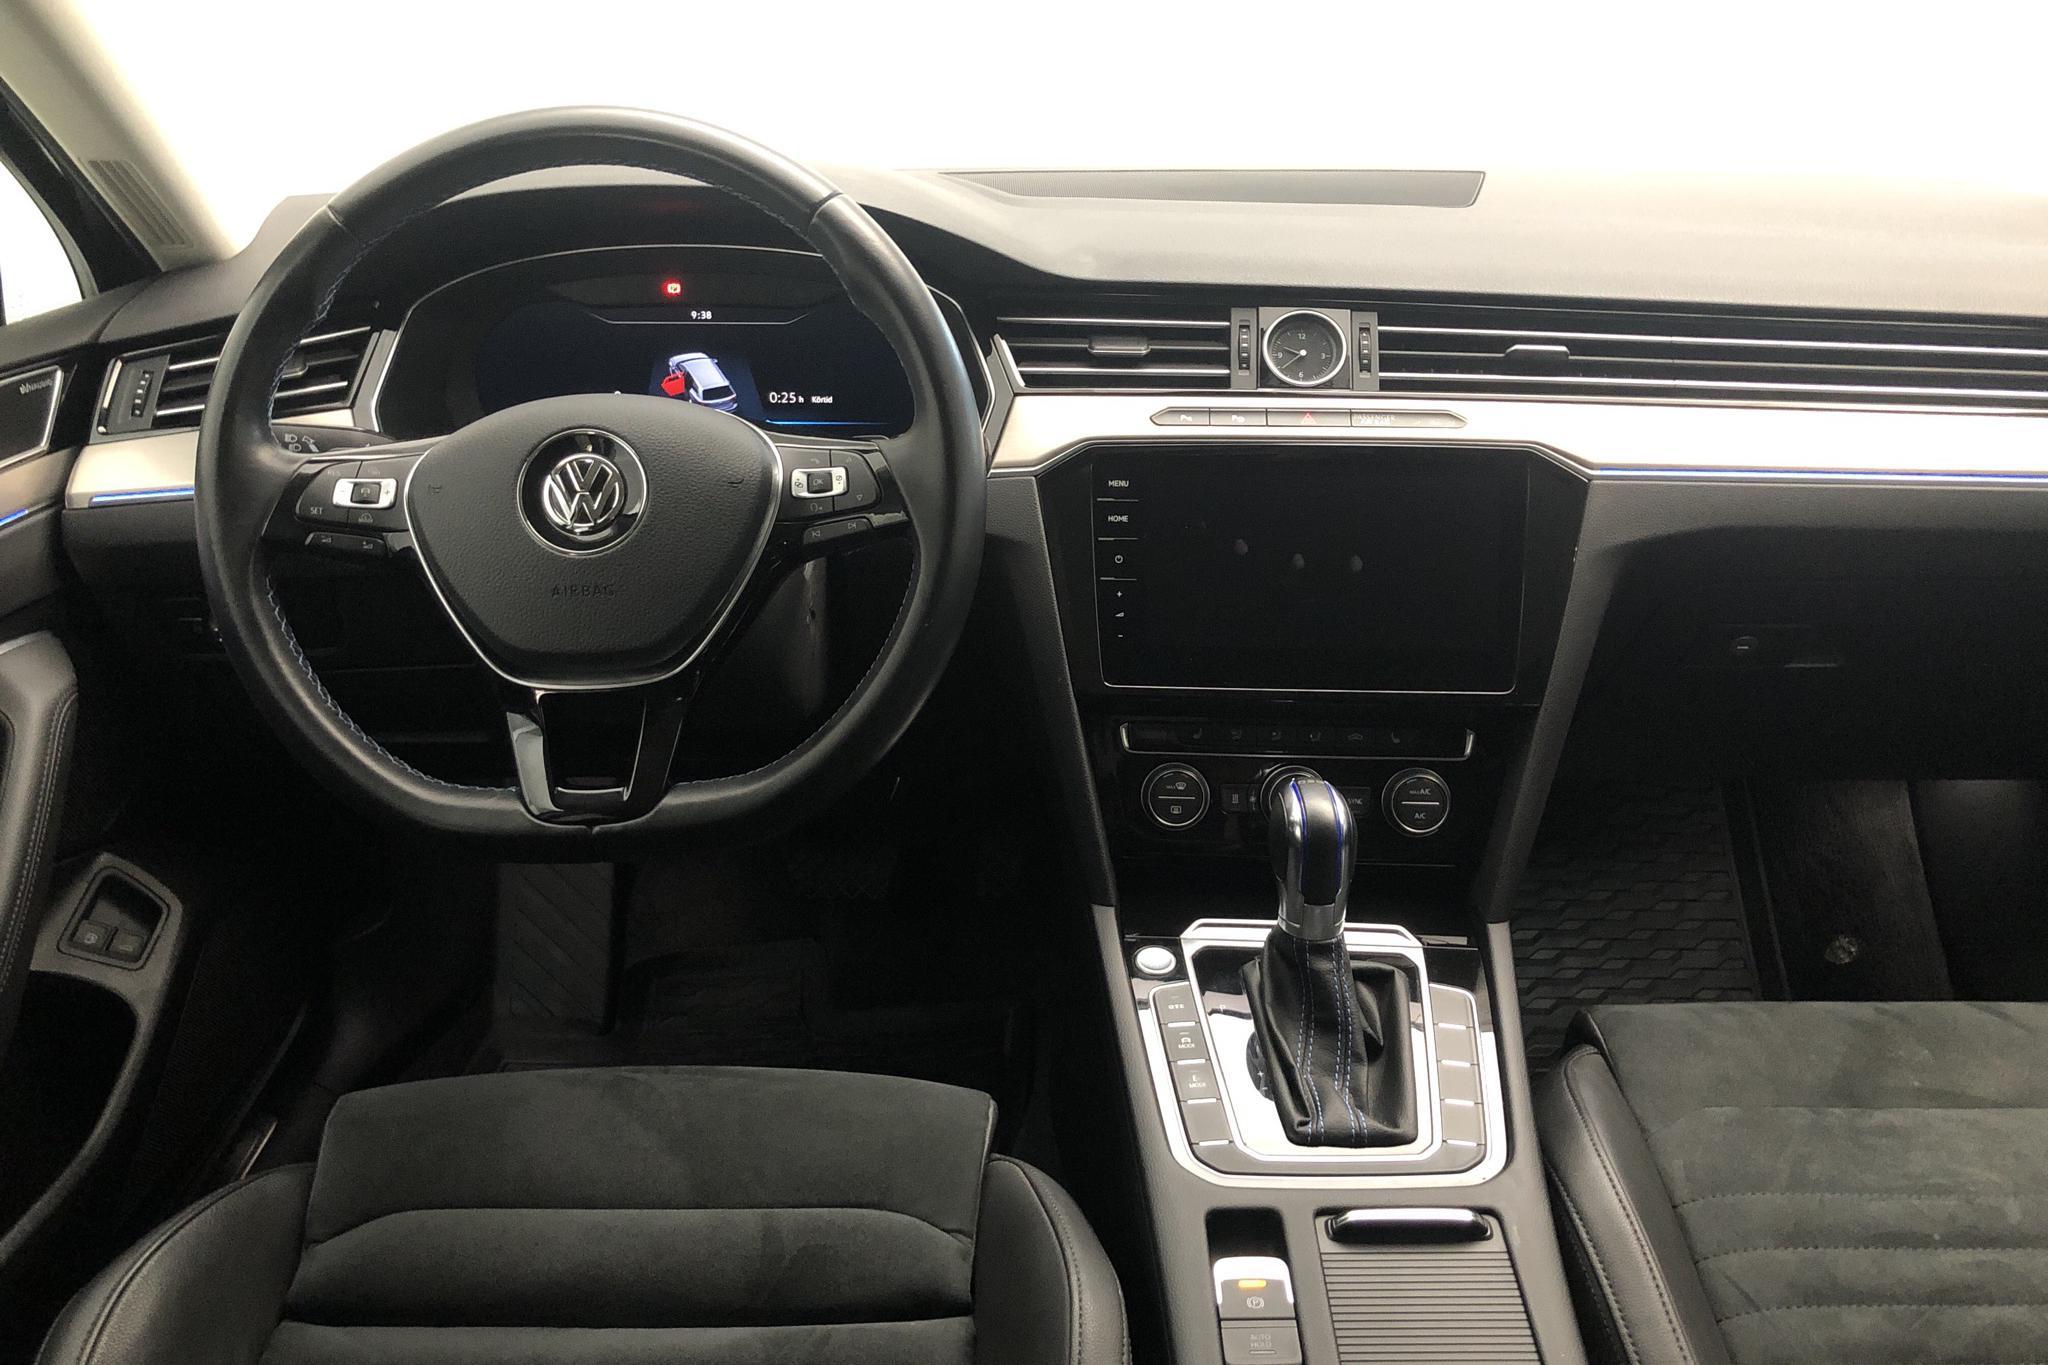 VW Passat 1.4 Plug-in-Hybrid Sportscombi (218hk) - 10 363 mil - Automat - svart - 2018